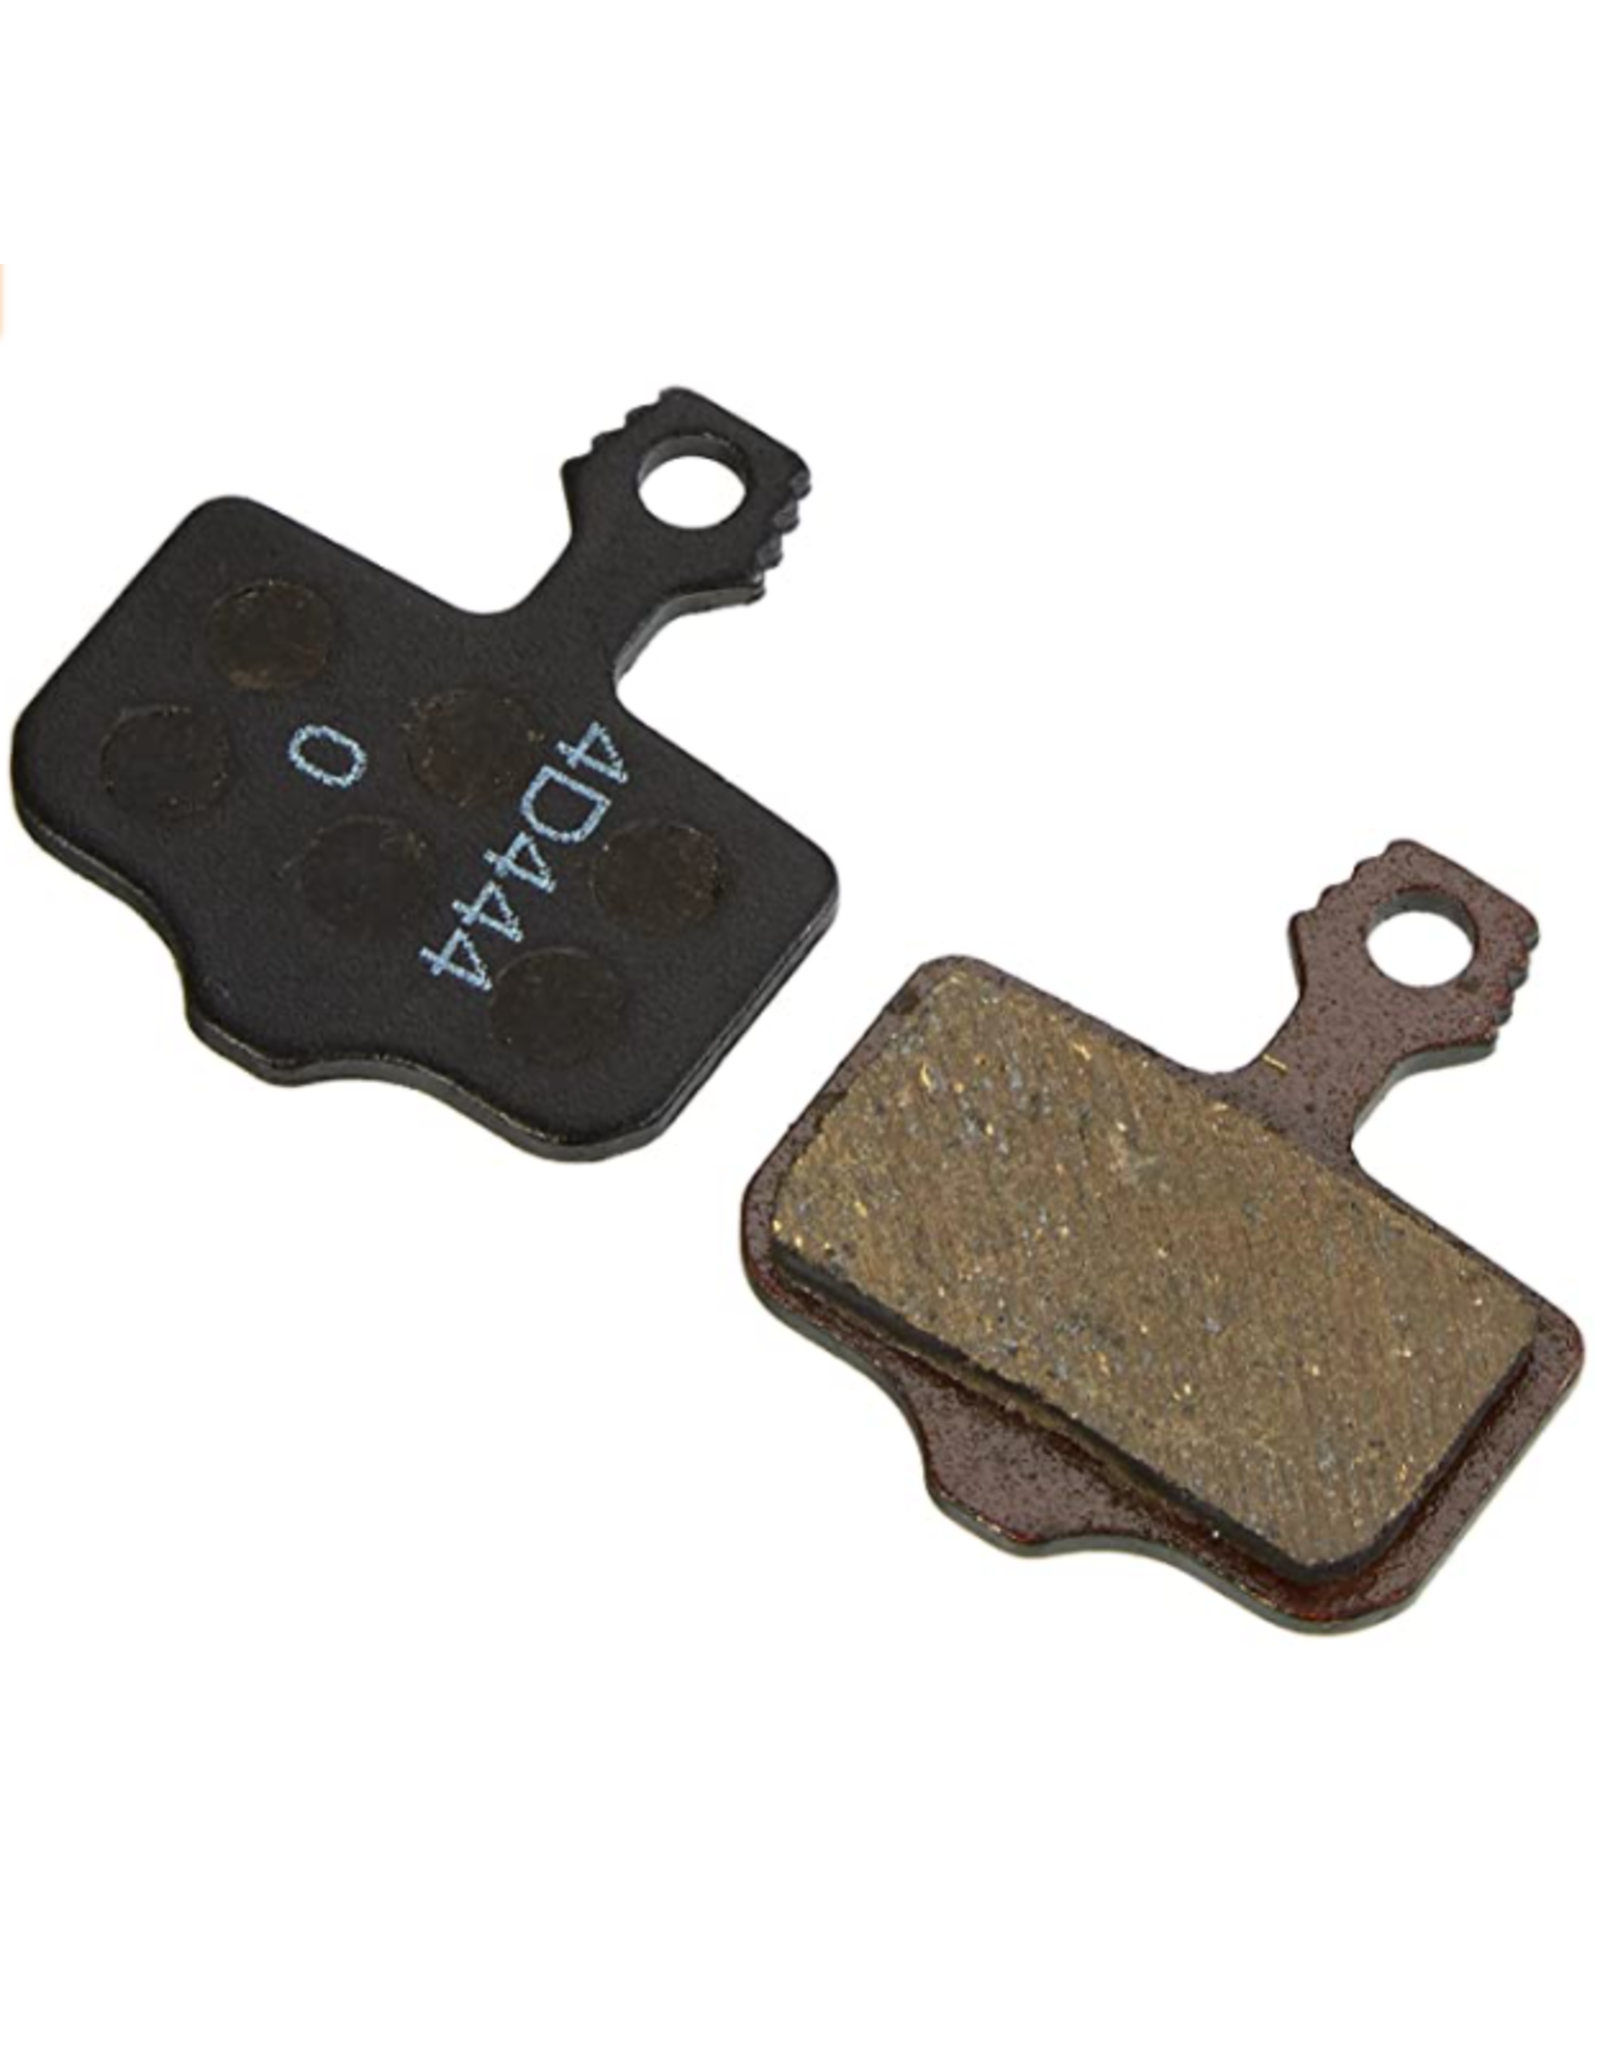 SRAM Plaquettes frein SRAM Level/Elix org/acier (vrac)